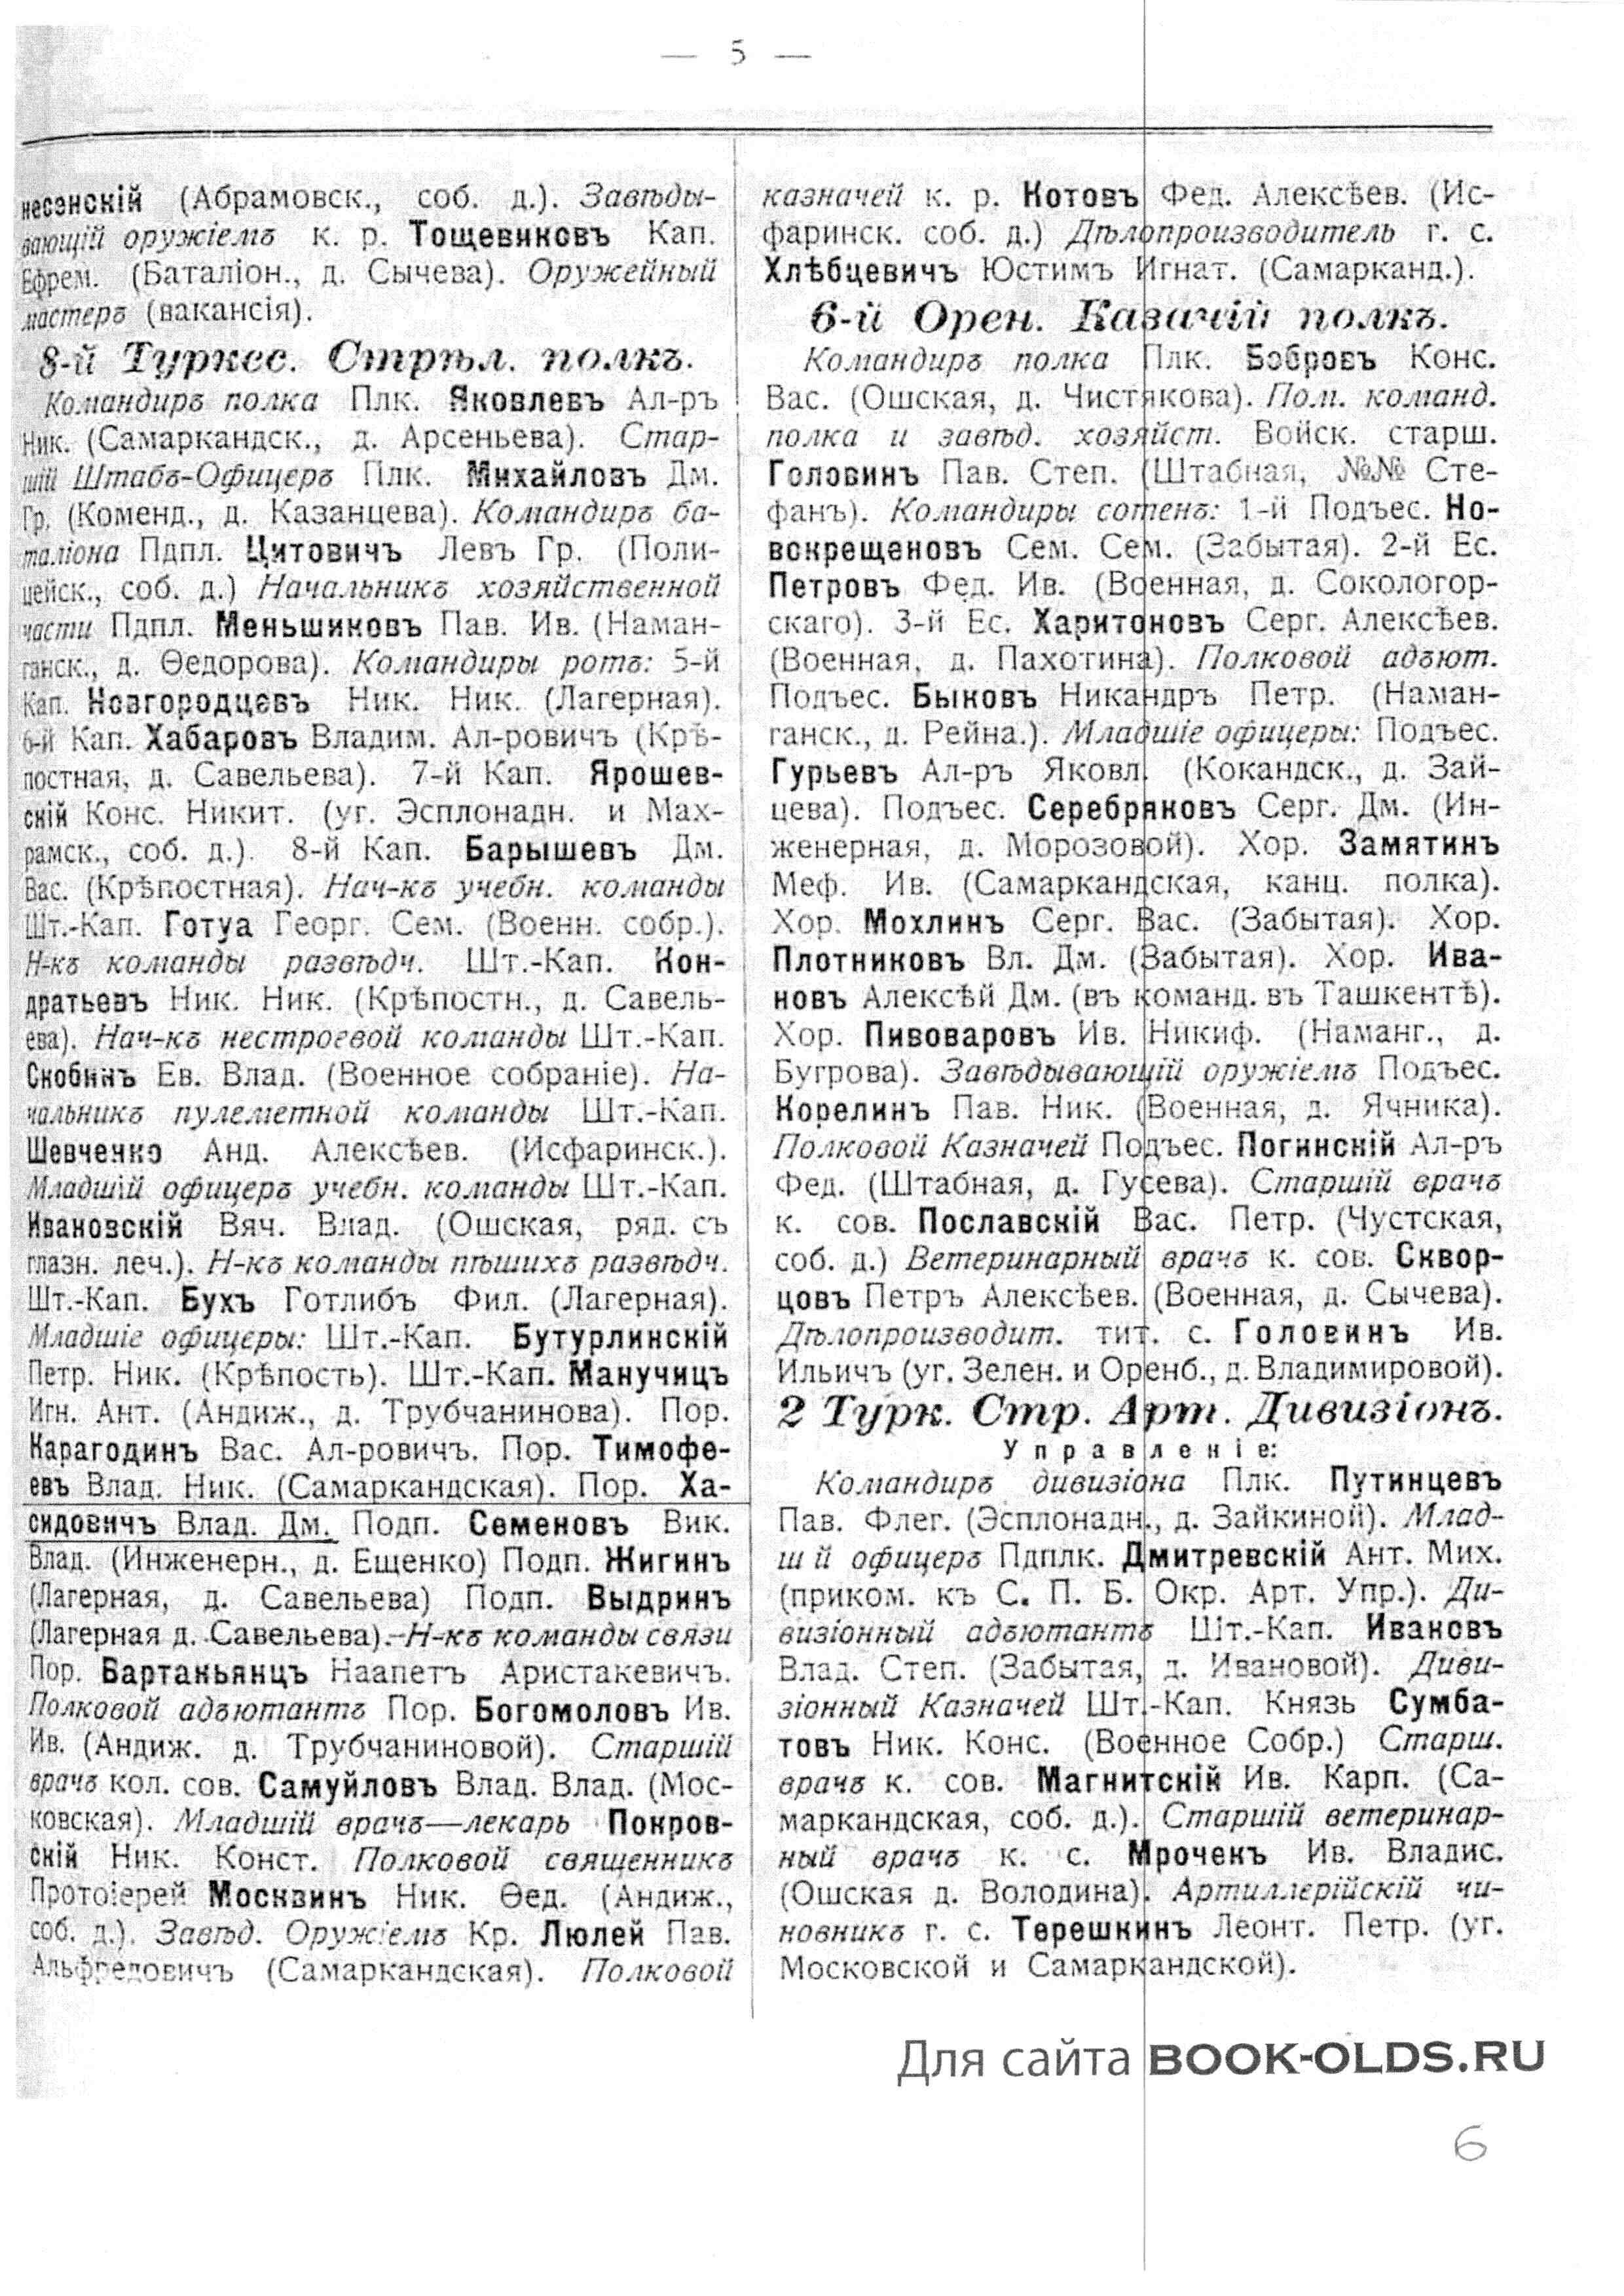 Photo: Хасидович Владимир Дмитриевич поручик 8-го Туркестанского полка, 1912 год